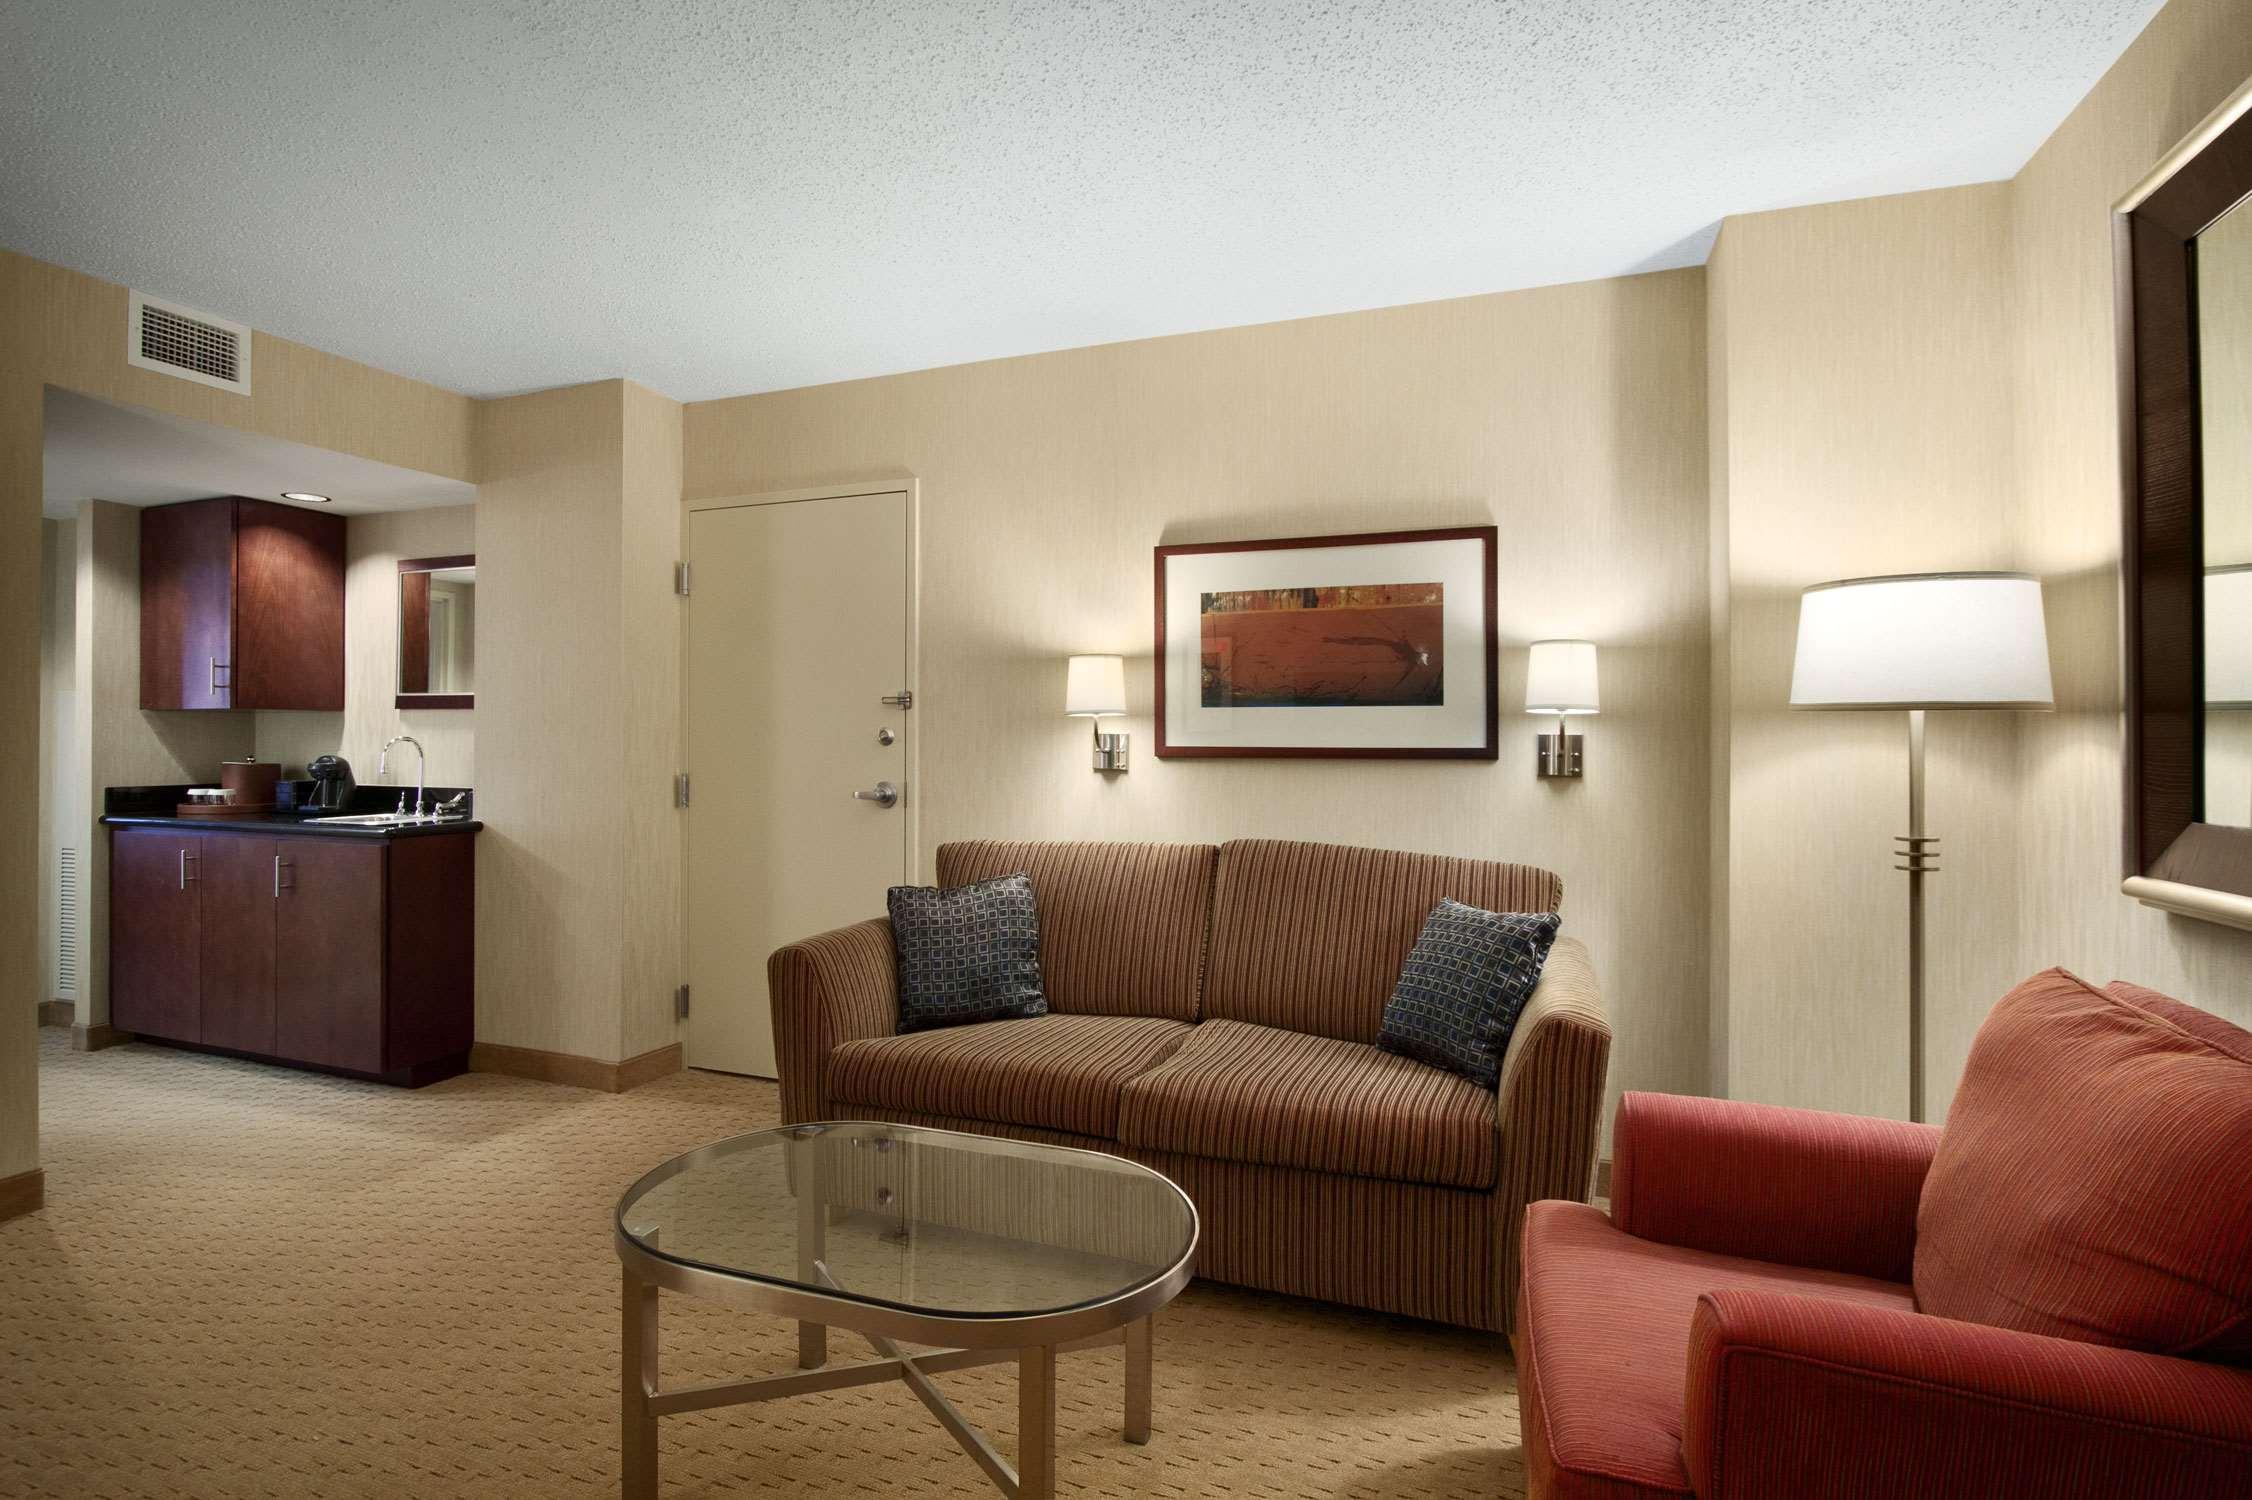 Embassy Suites by Hilton Washington DC Convention Center image 19